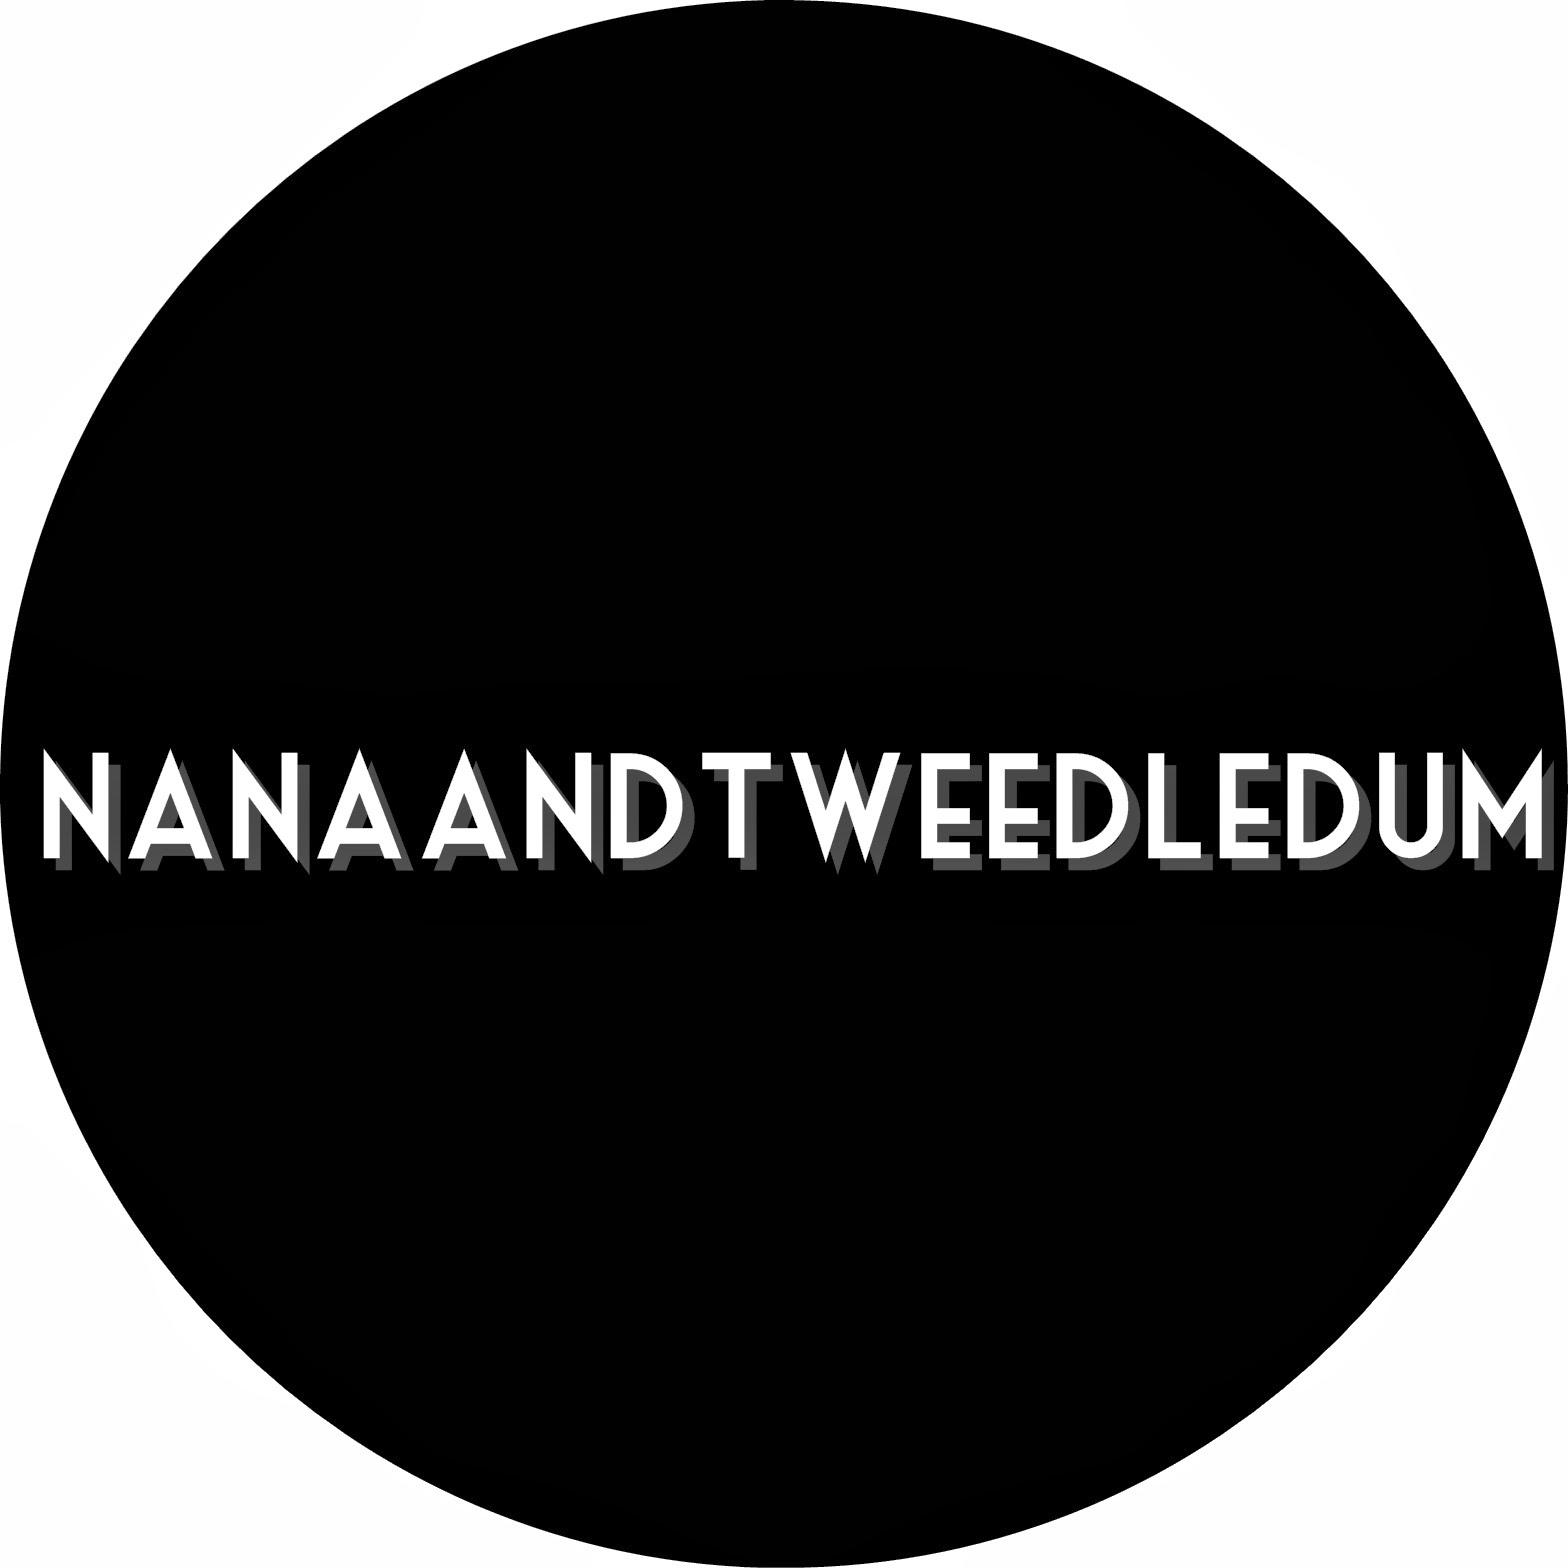 NANA & TWEEDLEDUM